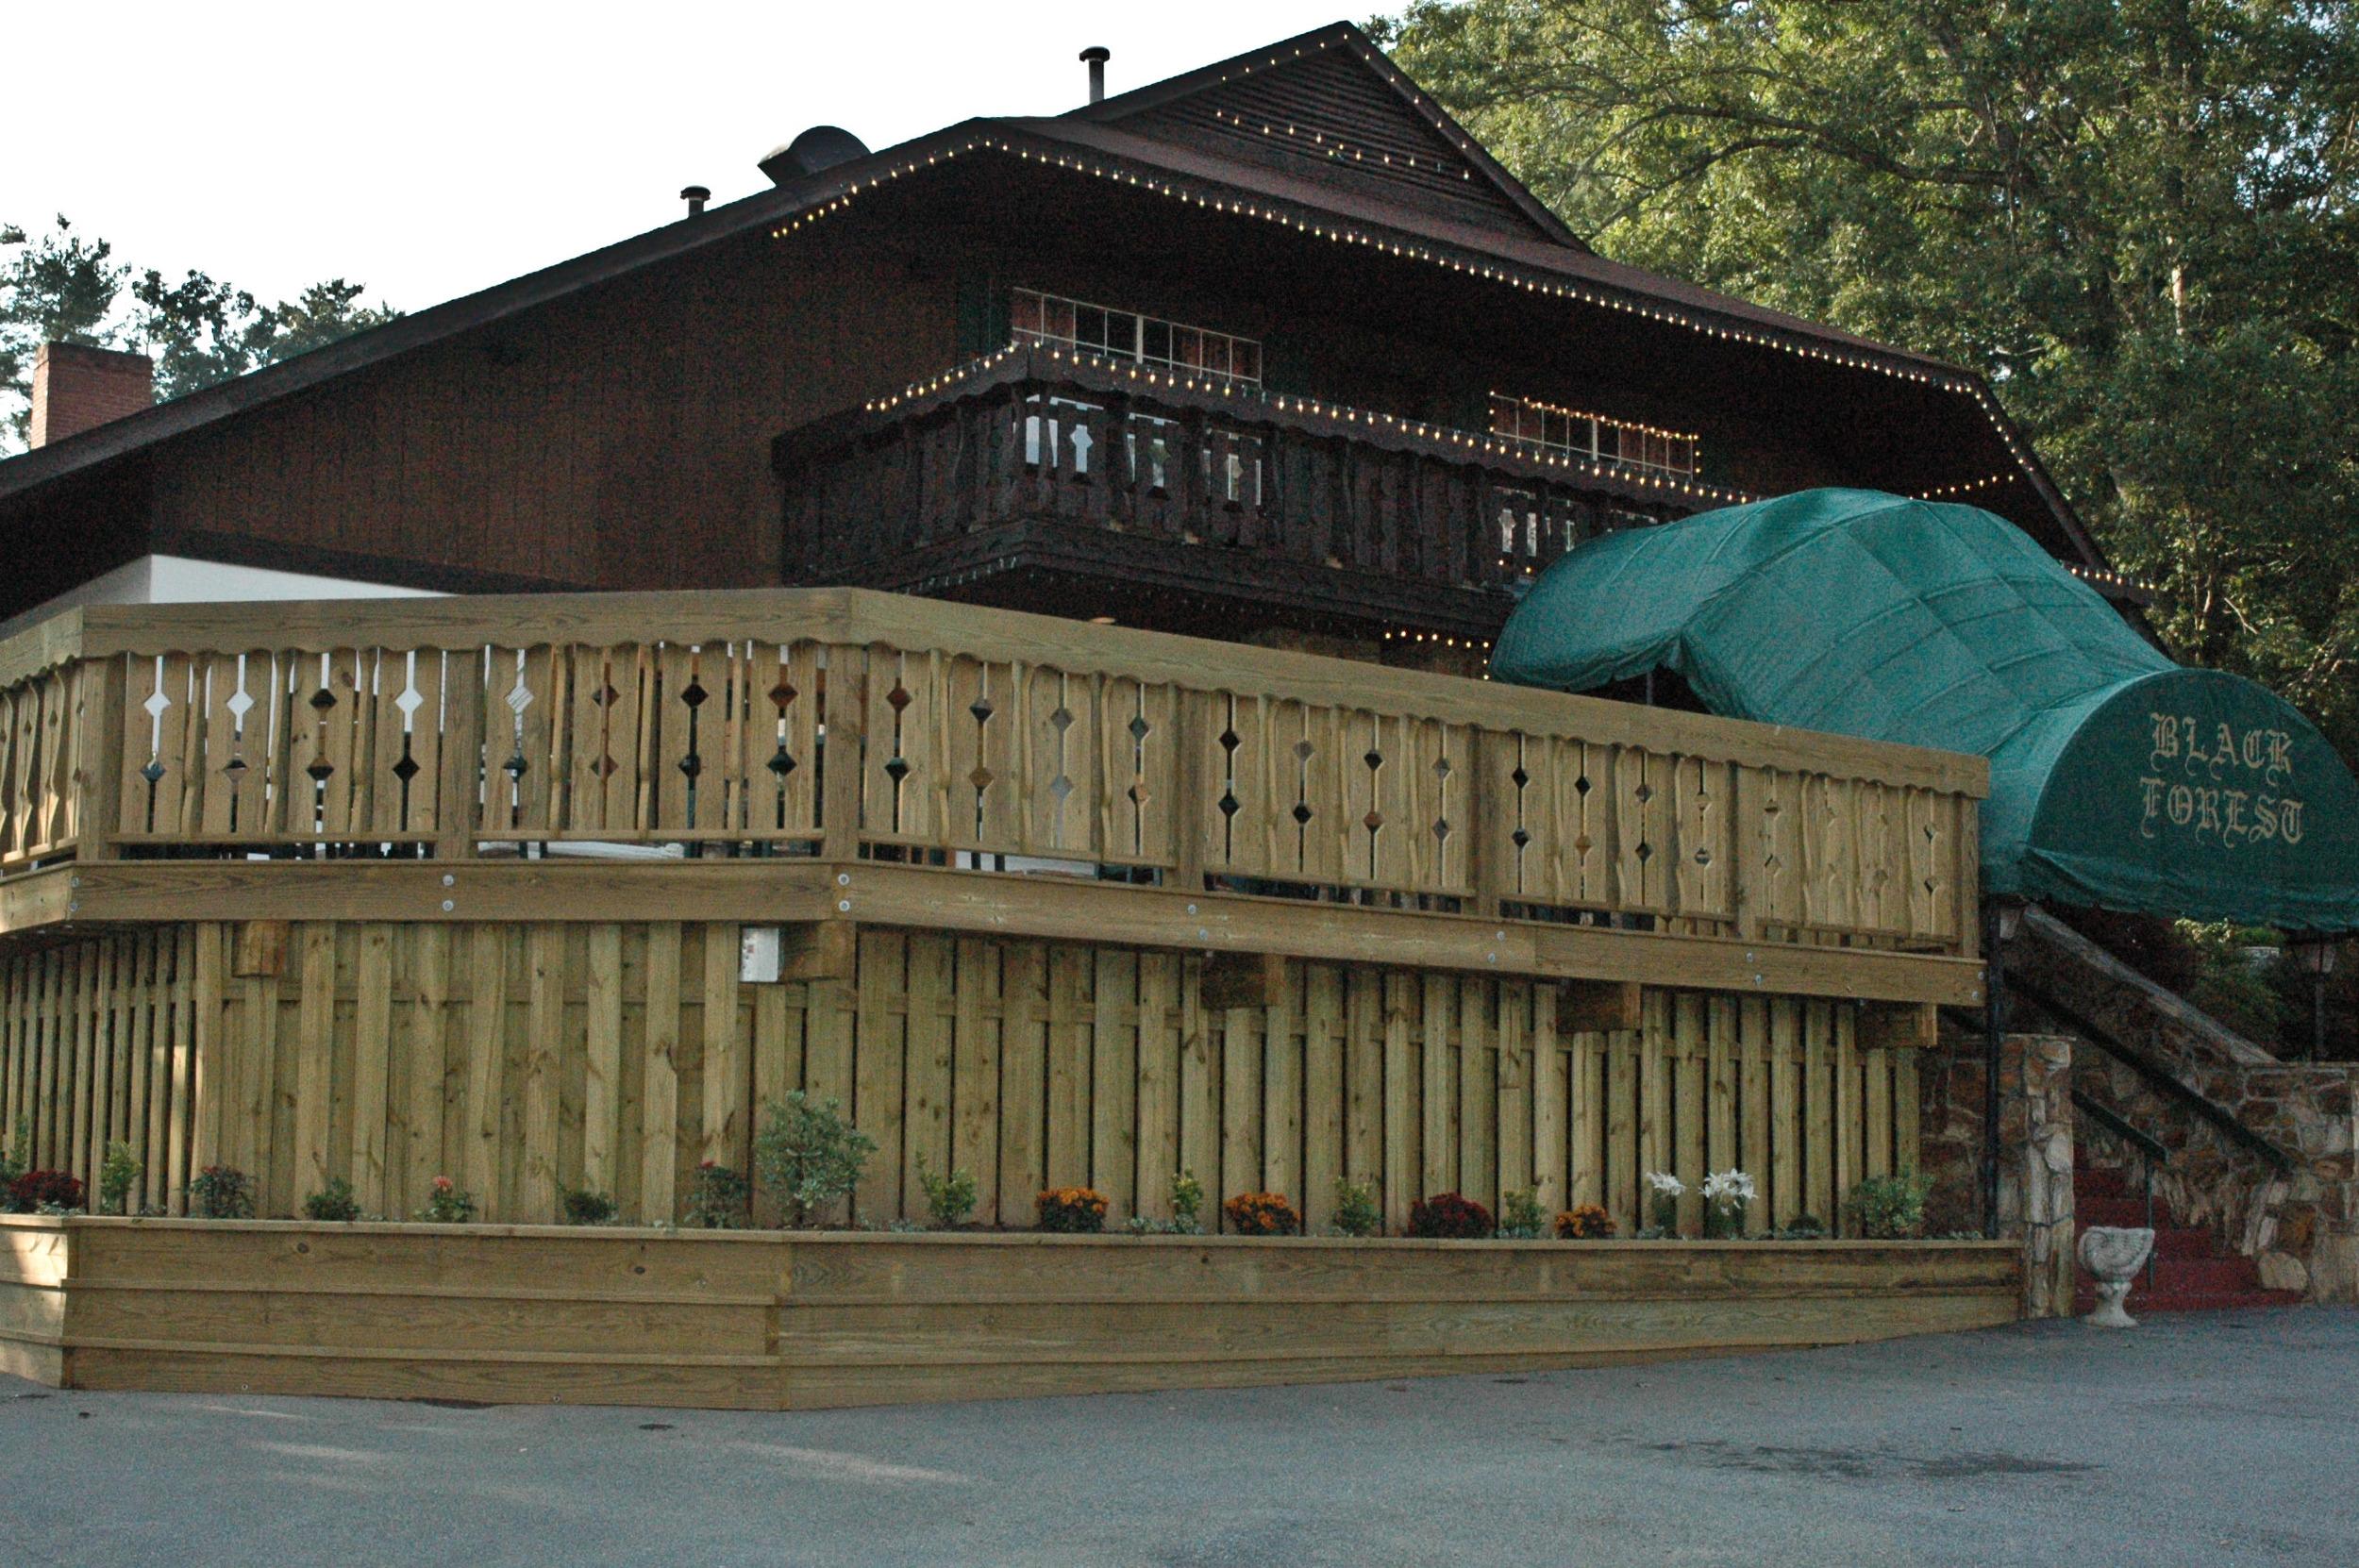 Black Forest Restaurant Asheville, Deck built to match existing details from original building.